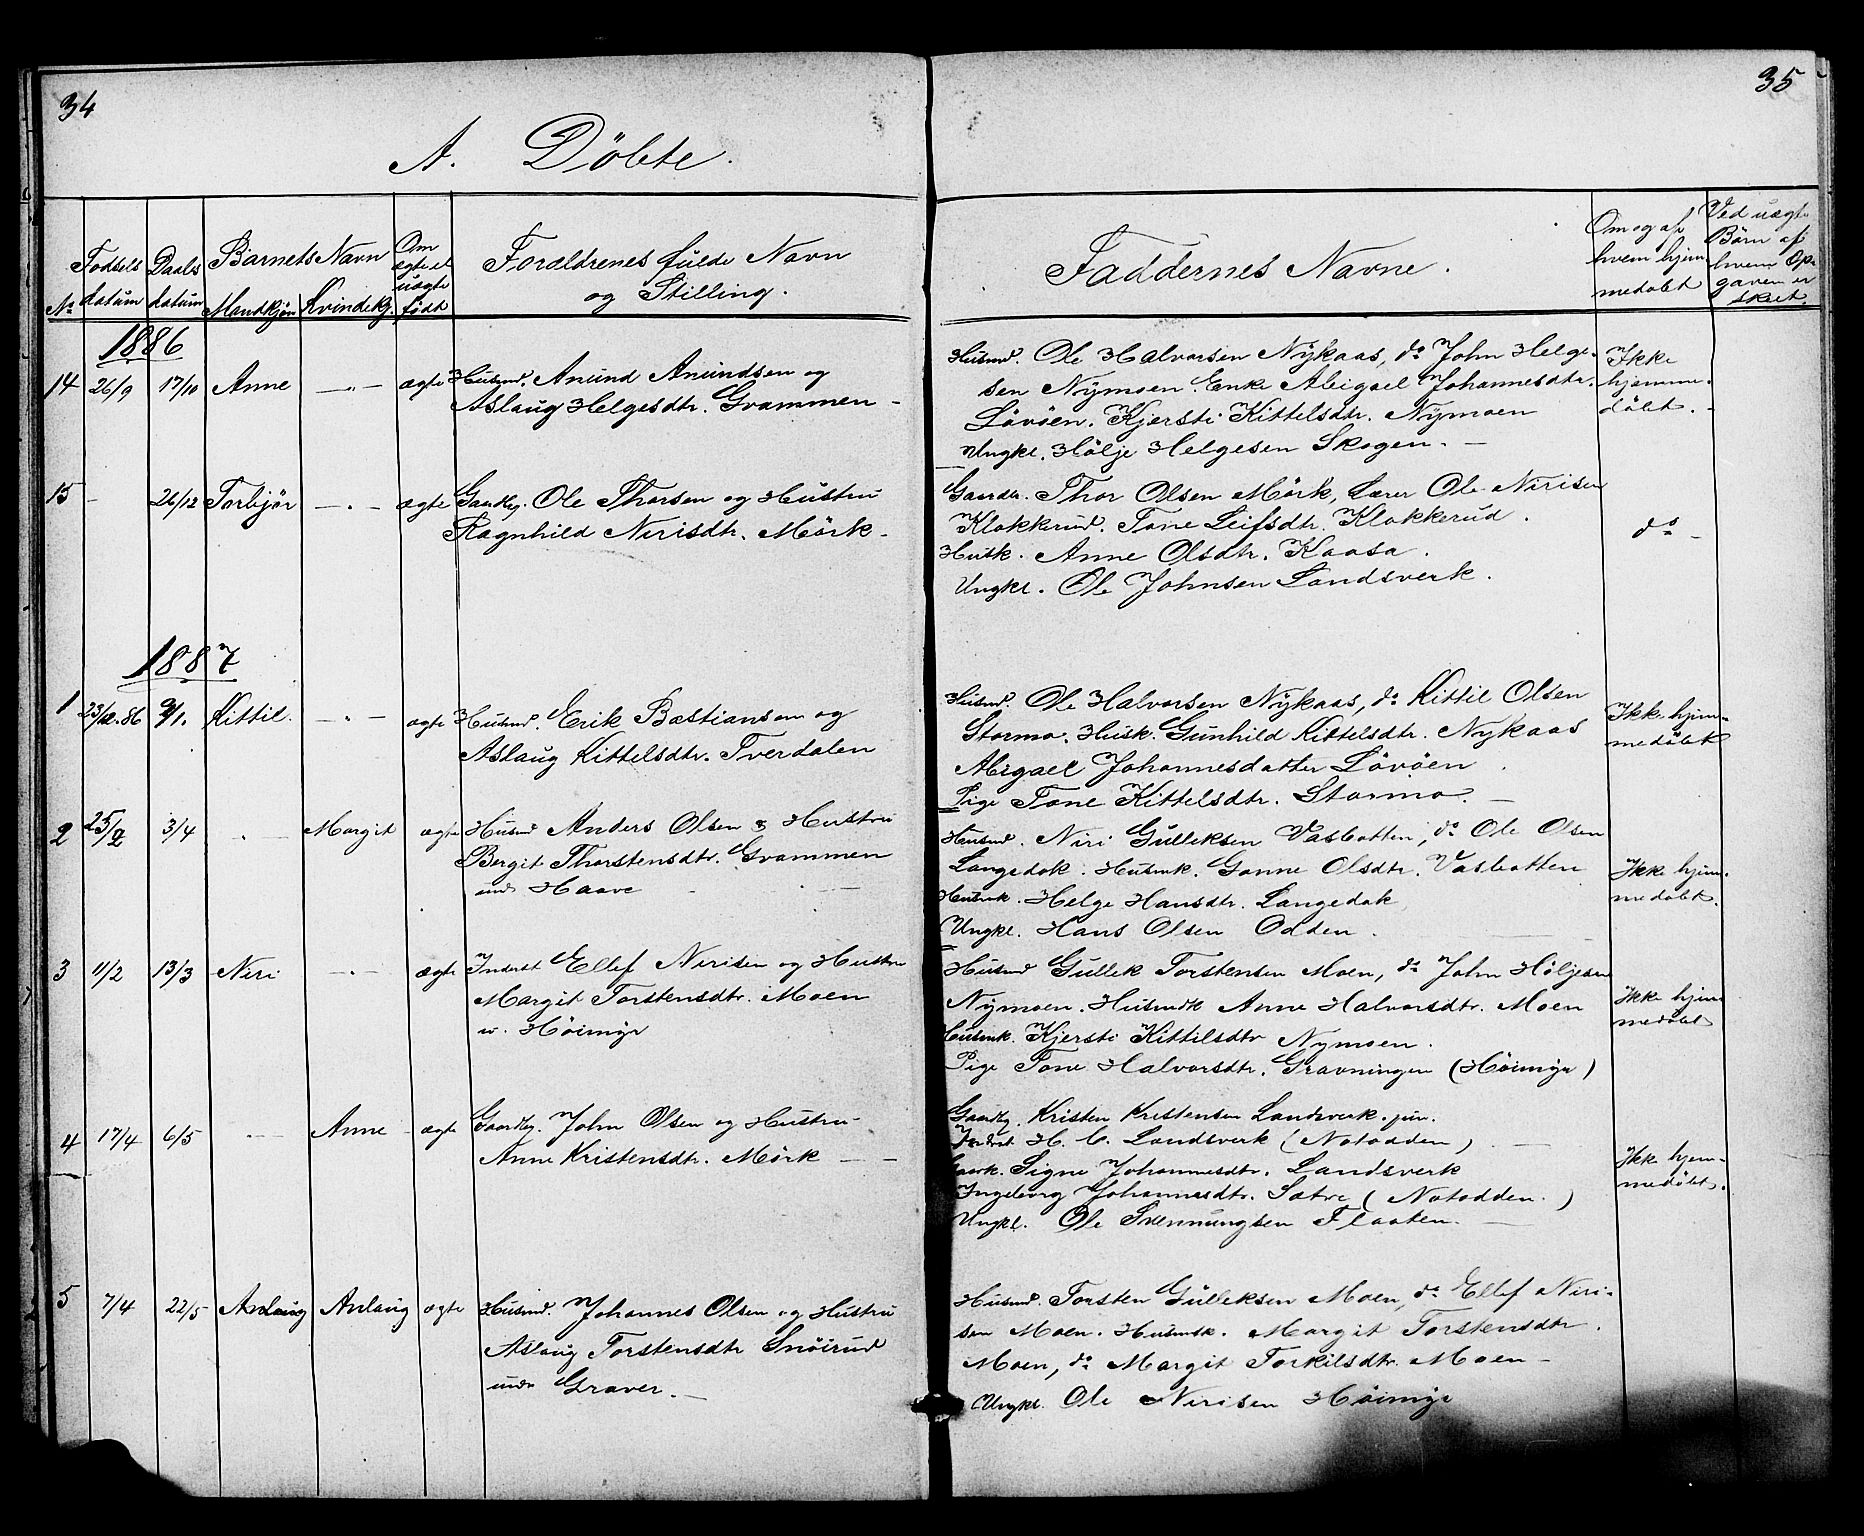 SAKO, Heddal kirkebøker, G/Gb/L0001: Klokkerbok nr. II 1, 1866-1887, s. 34-35